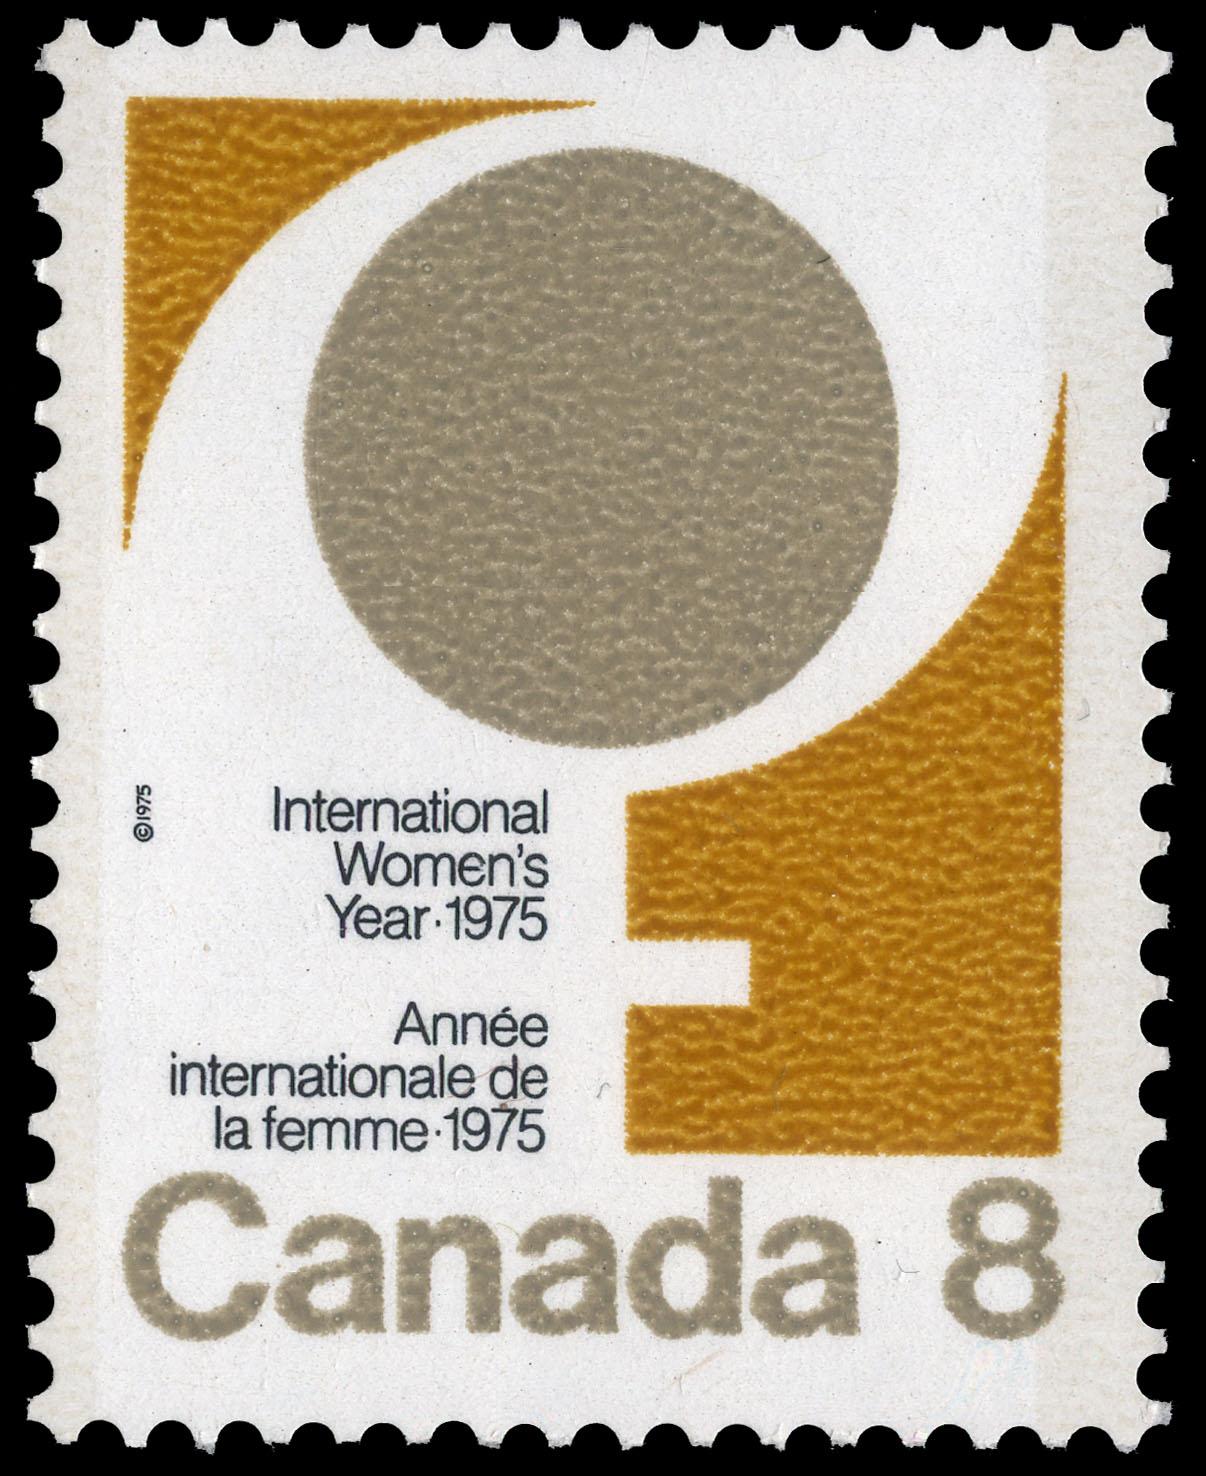 International Women's Year, 1975 Canada Postage Stamp